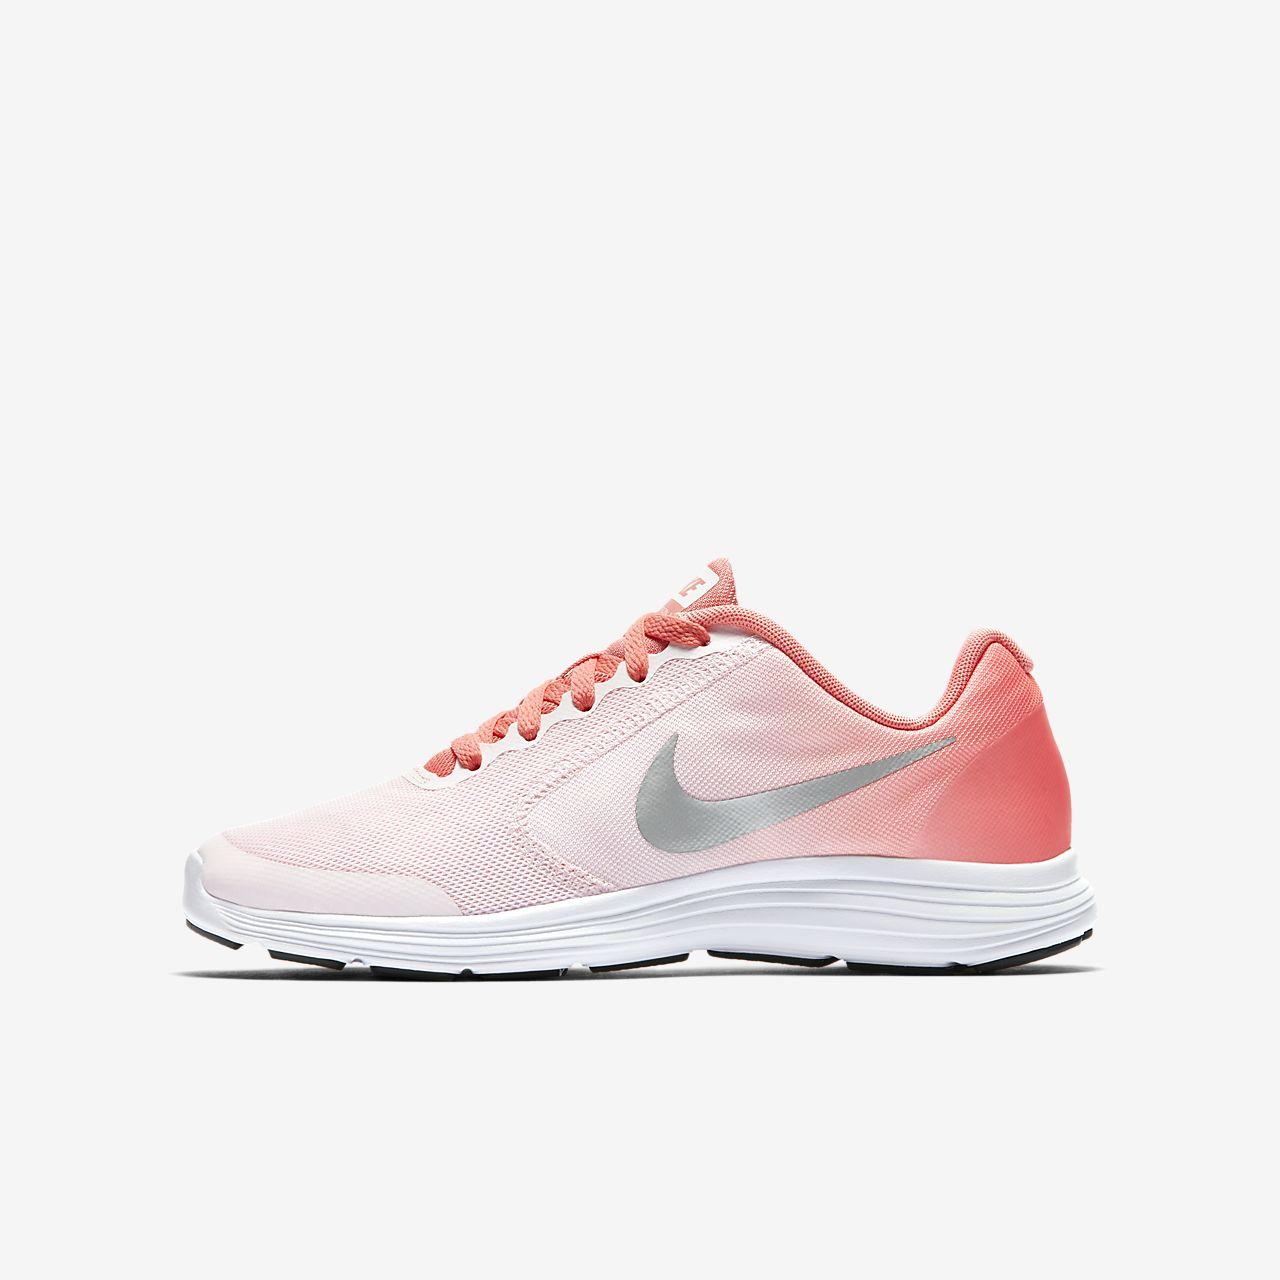 5ec9929788 Nike Revolution 3 Laufschuh für ältere Kinder. Nike.com CH